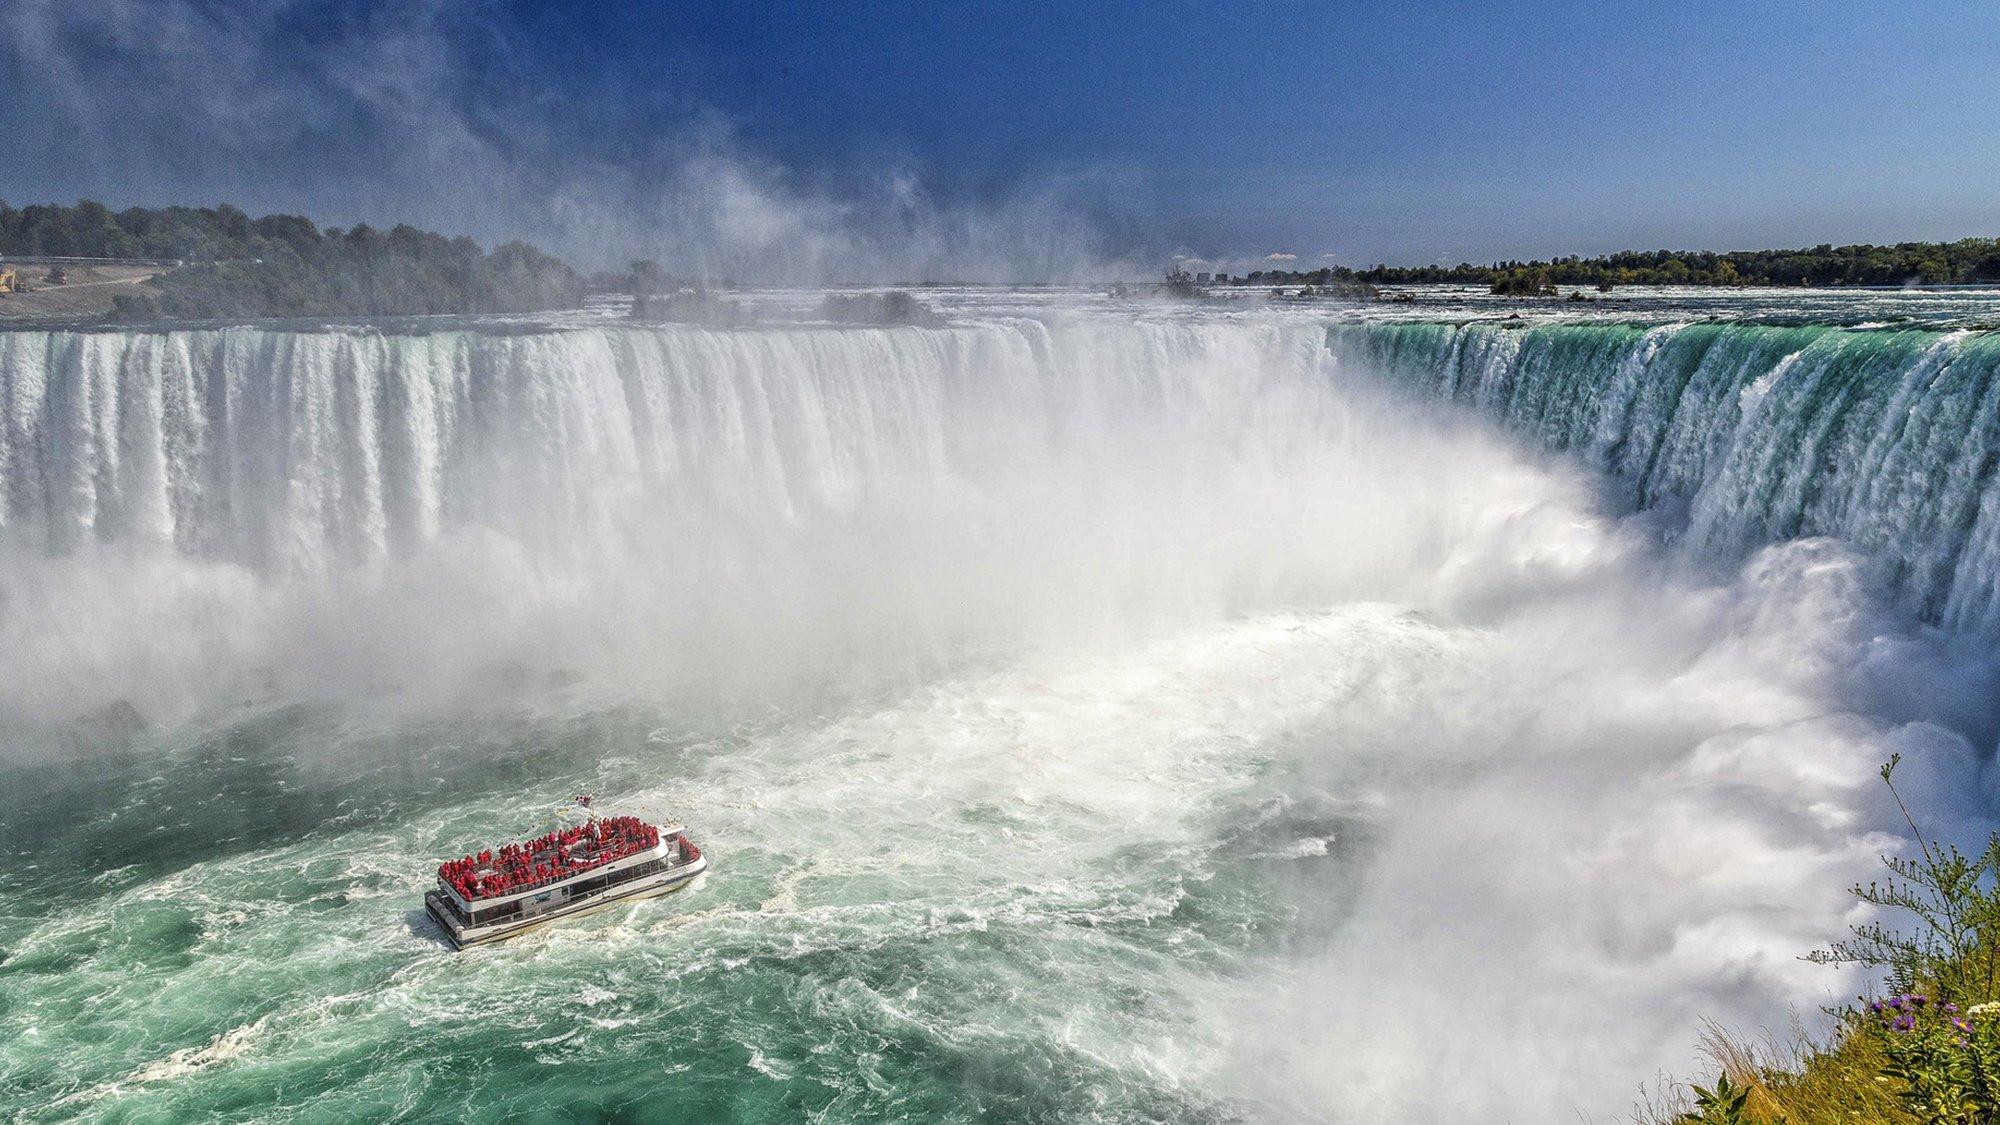 Best time of year to visit Niagara Falls